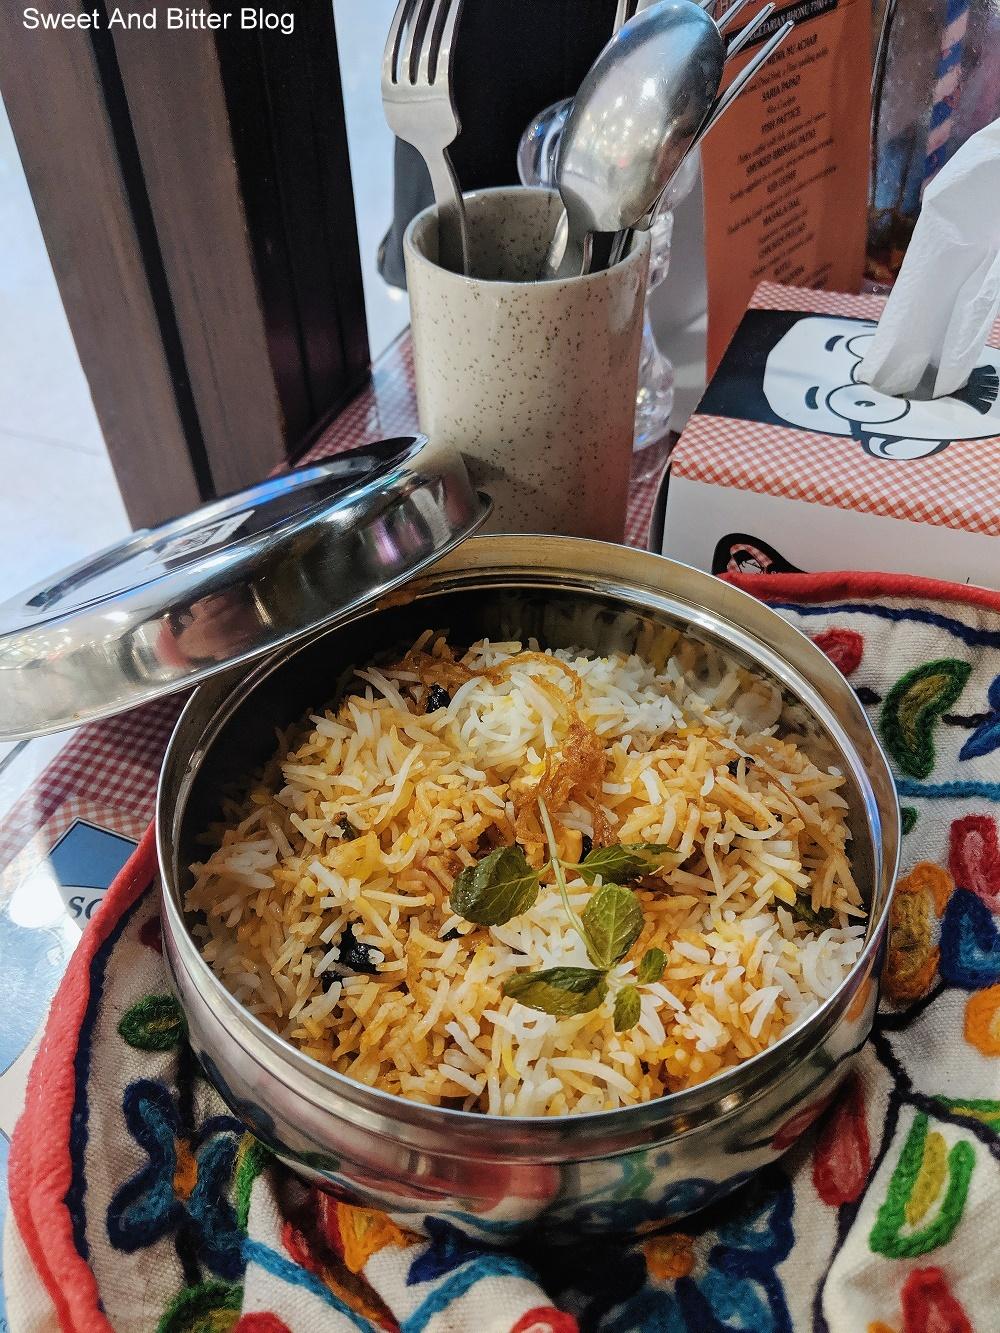 SodaBottleOpenerWala Berry Pulao Parsi Food Delhi